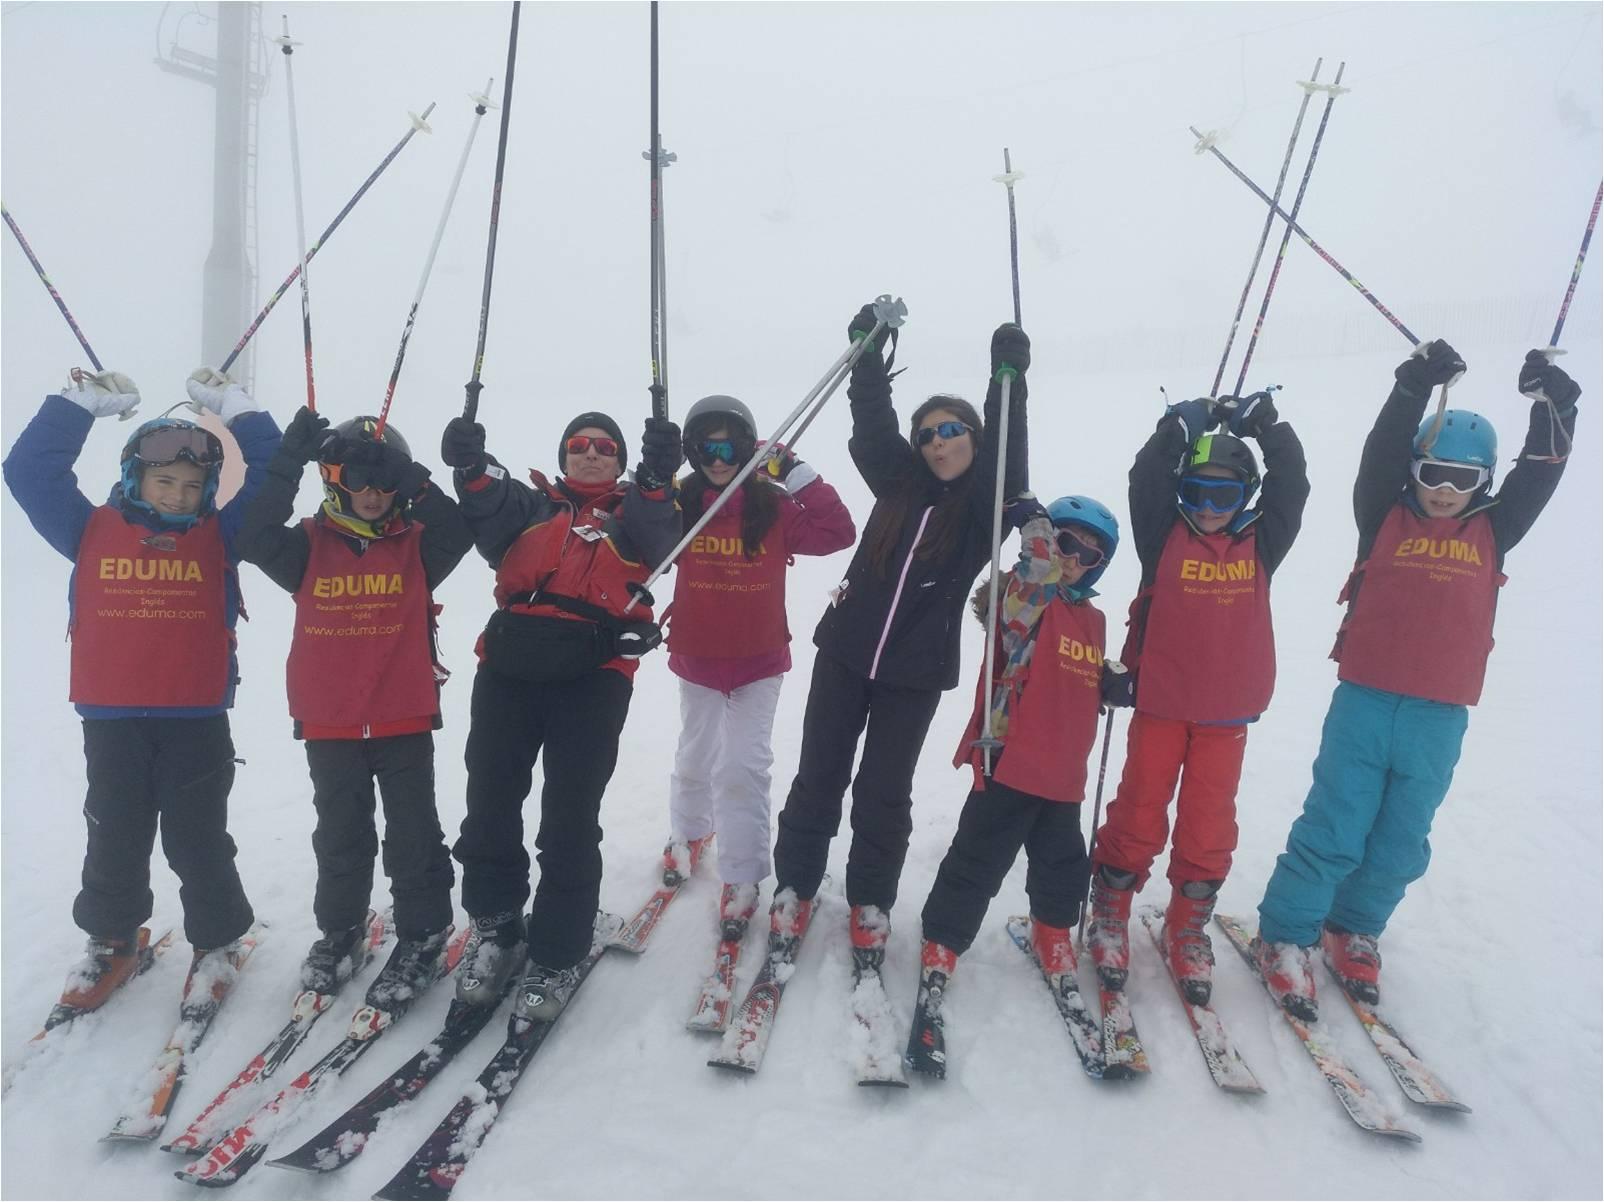 viajes a la nieve organizados para aprender a esquiar